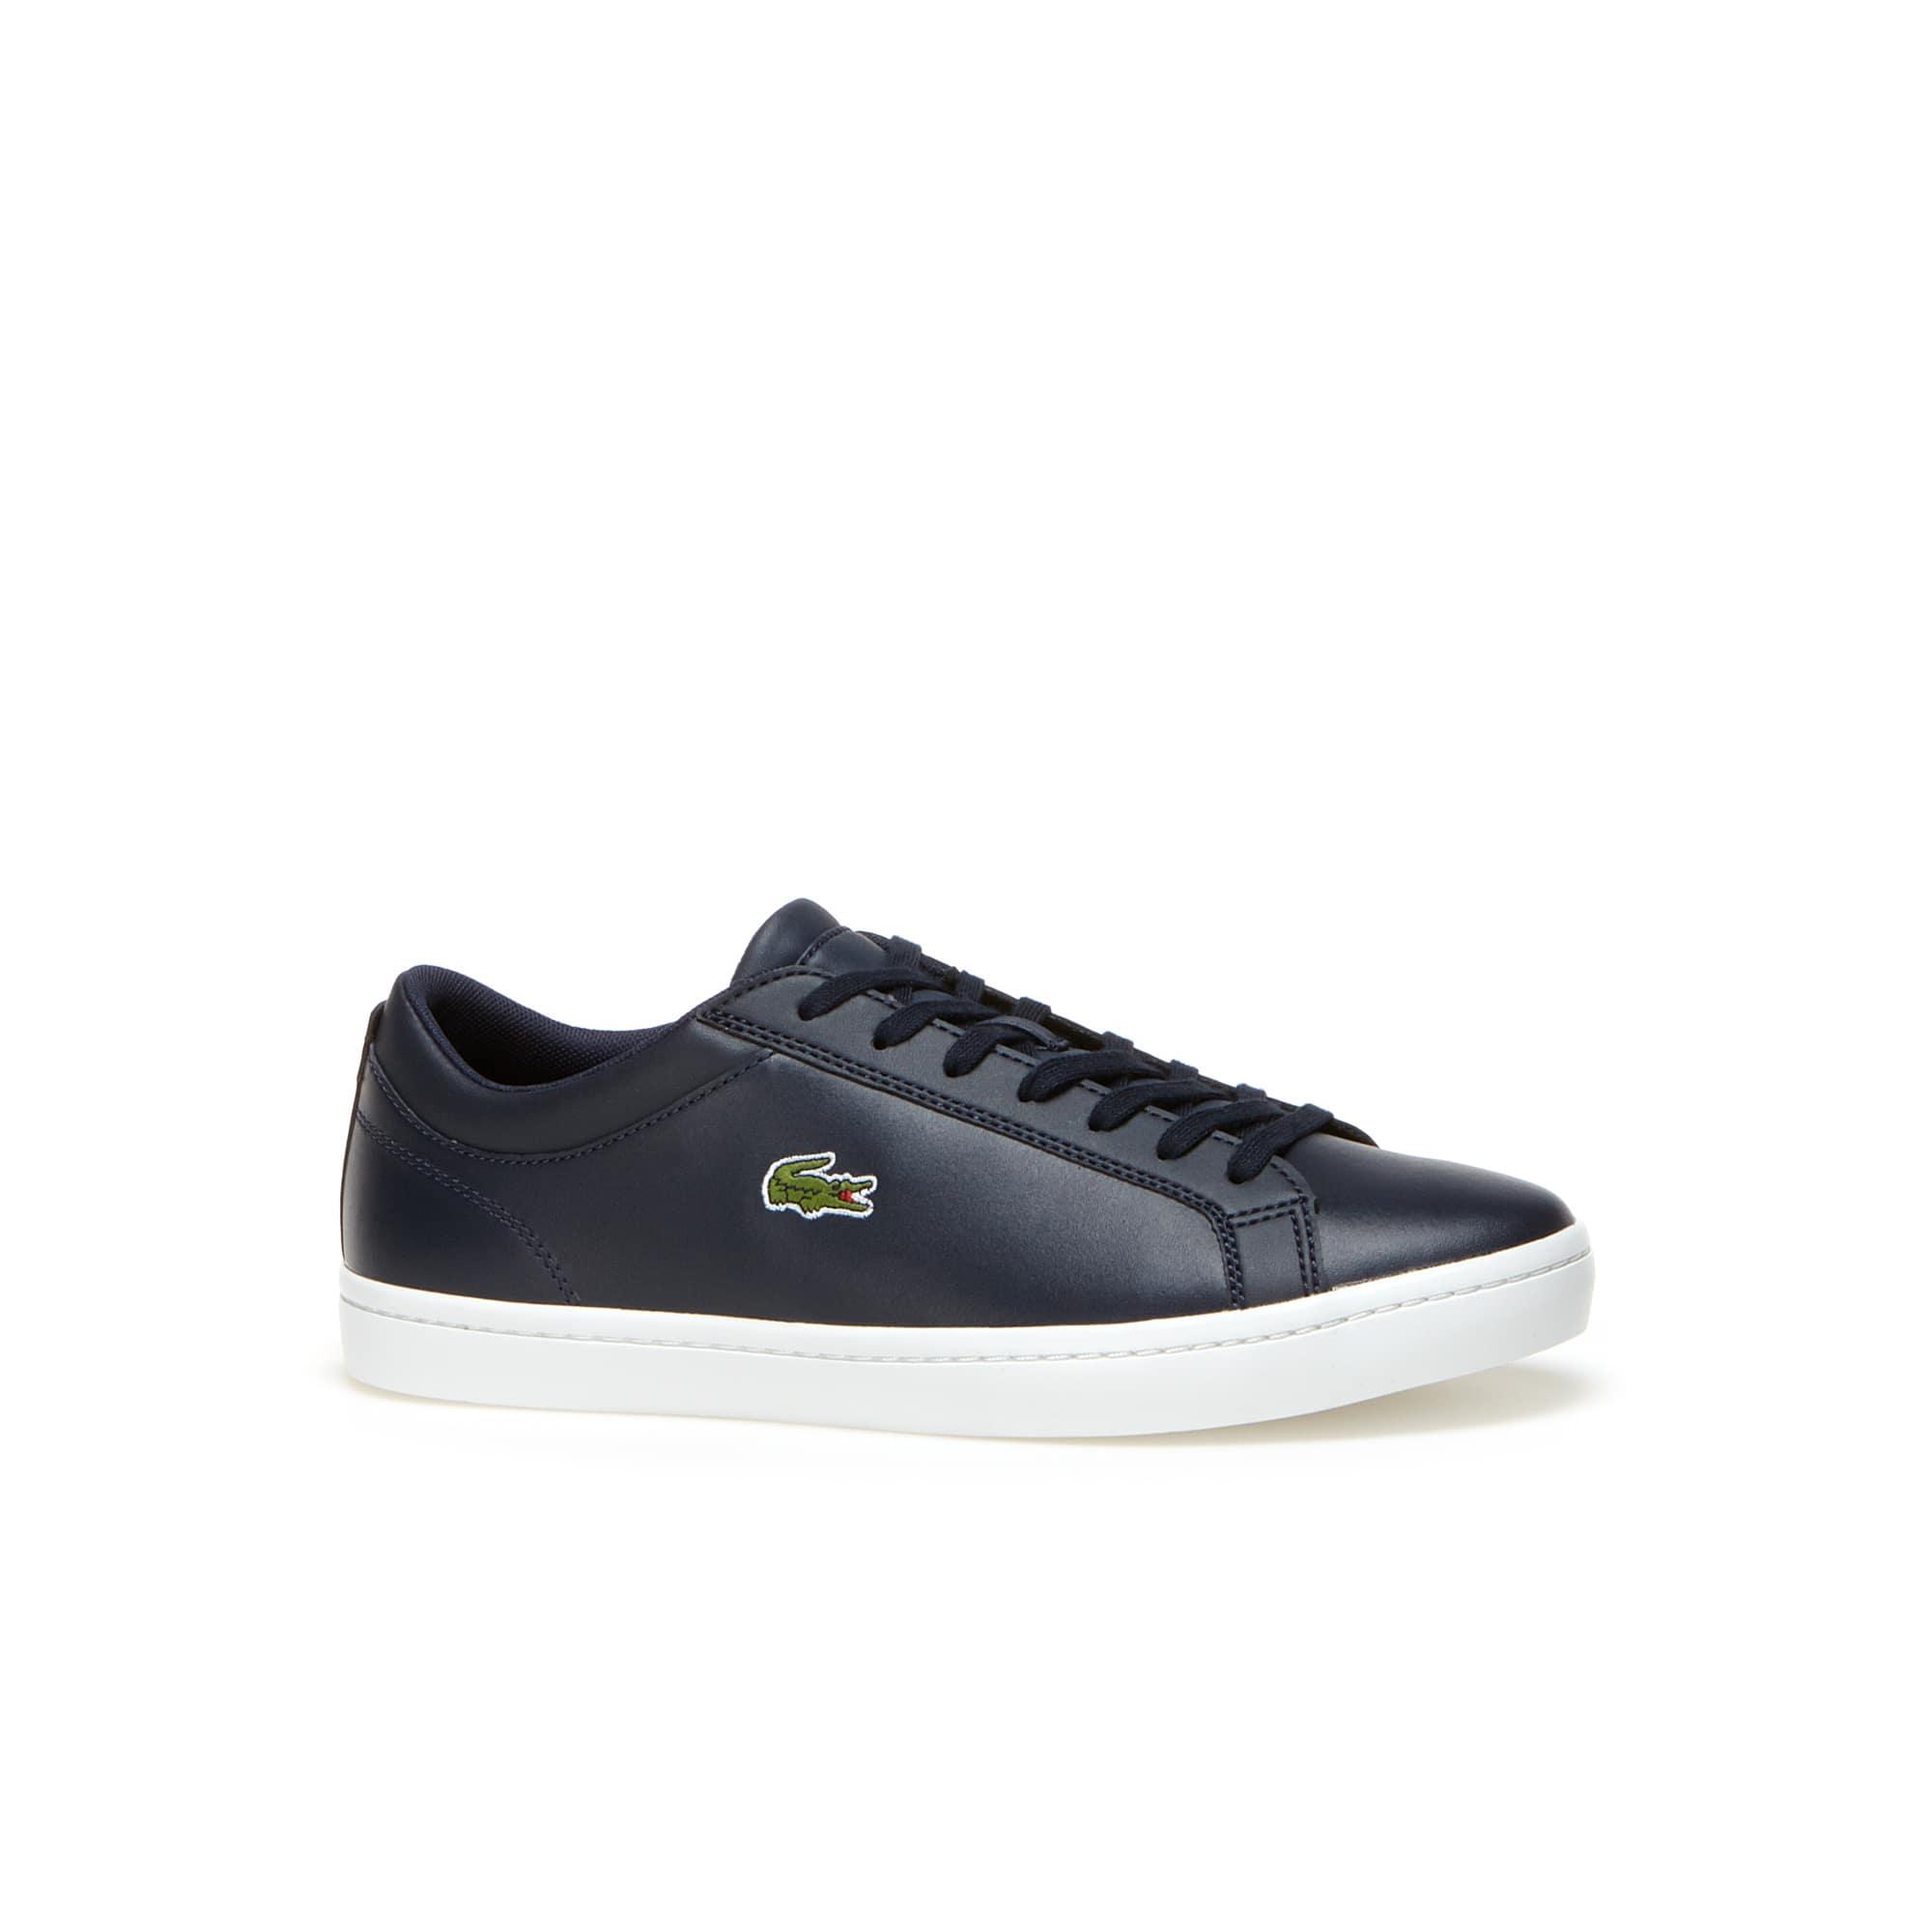 Sneaker Lacoste Da Da Lacoste Sneaker UomoScarpe UomoScarpe YybI6f7vg